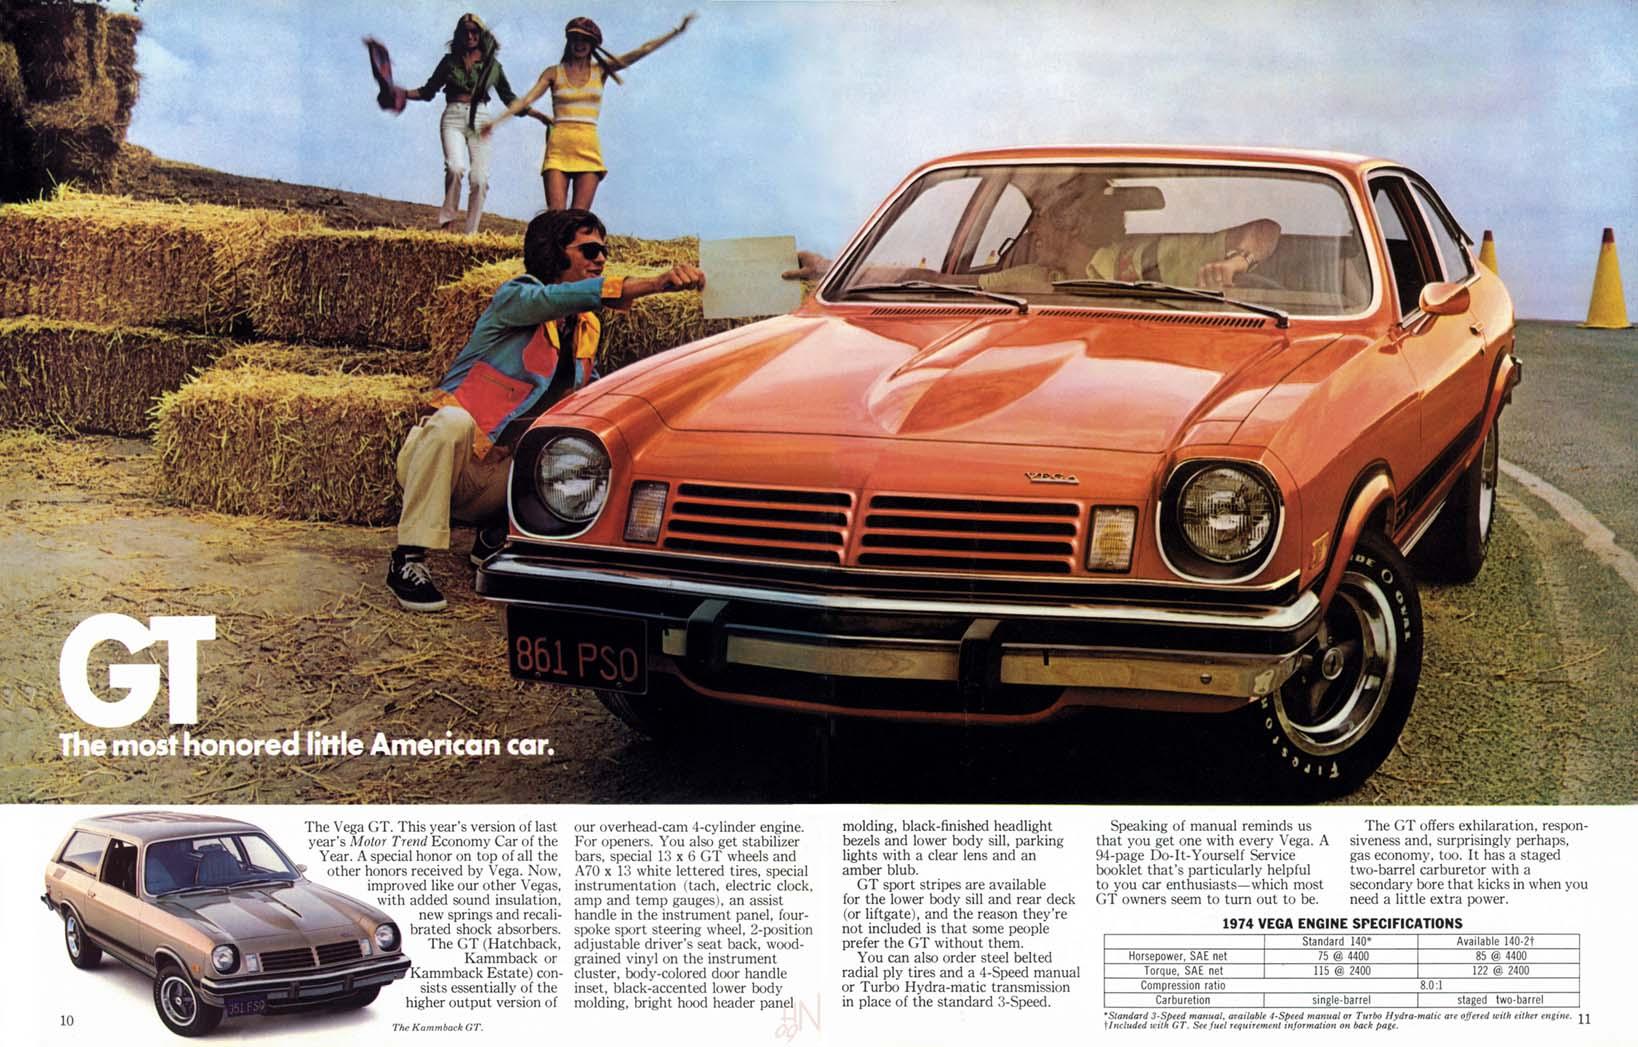 All Chevy 74 chevy vega gt : 1974 Chevrolet VEga brochure